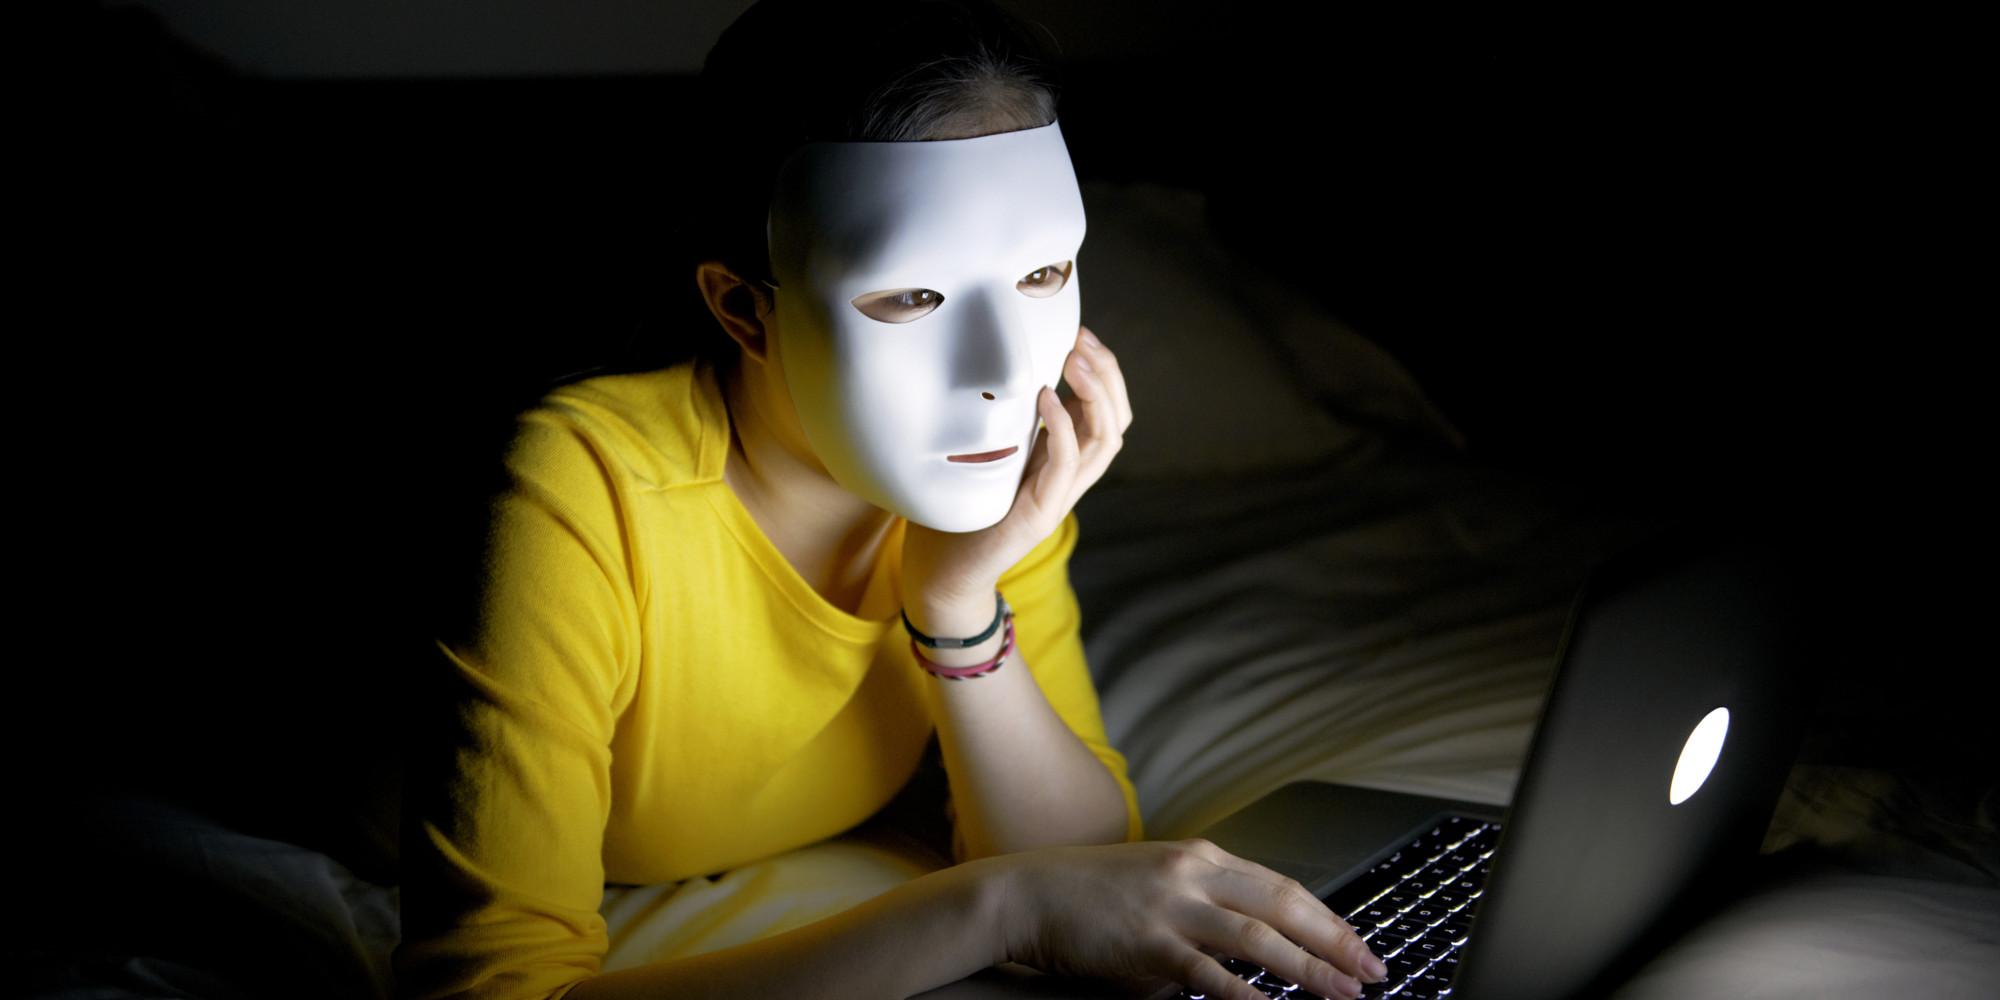 Internet Trolls Who Set Up Fake Profiles To Humiliate